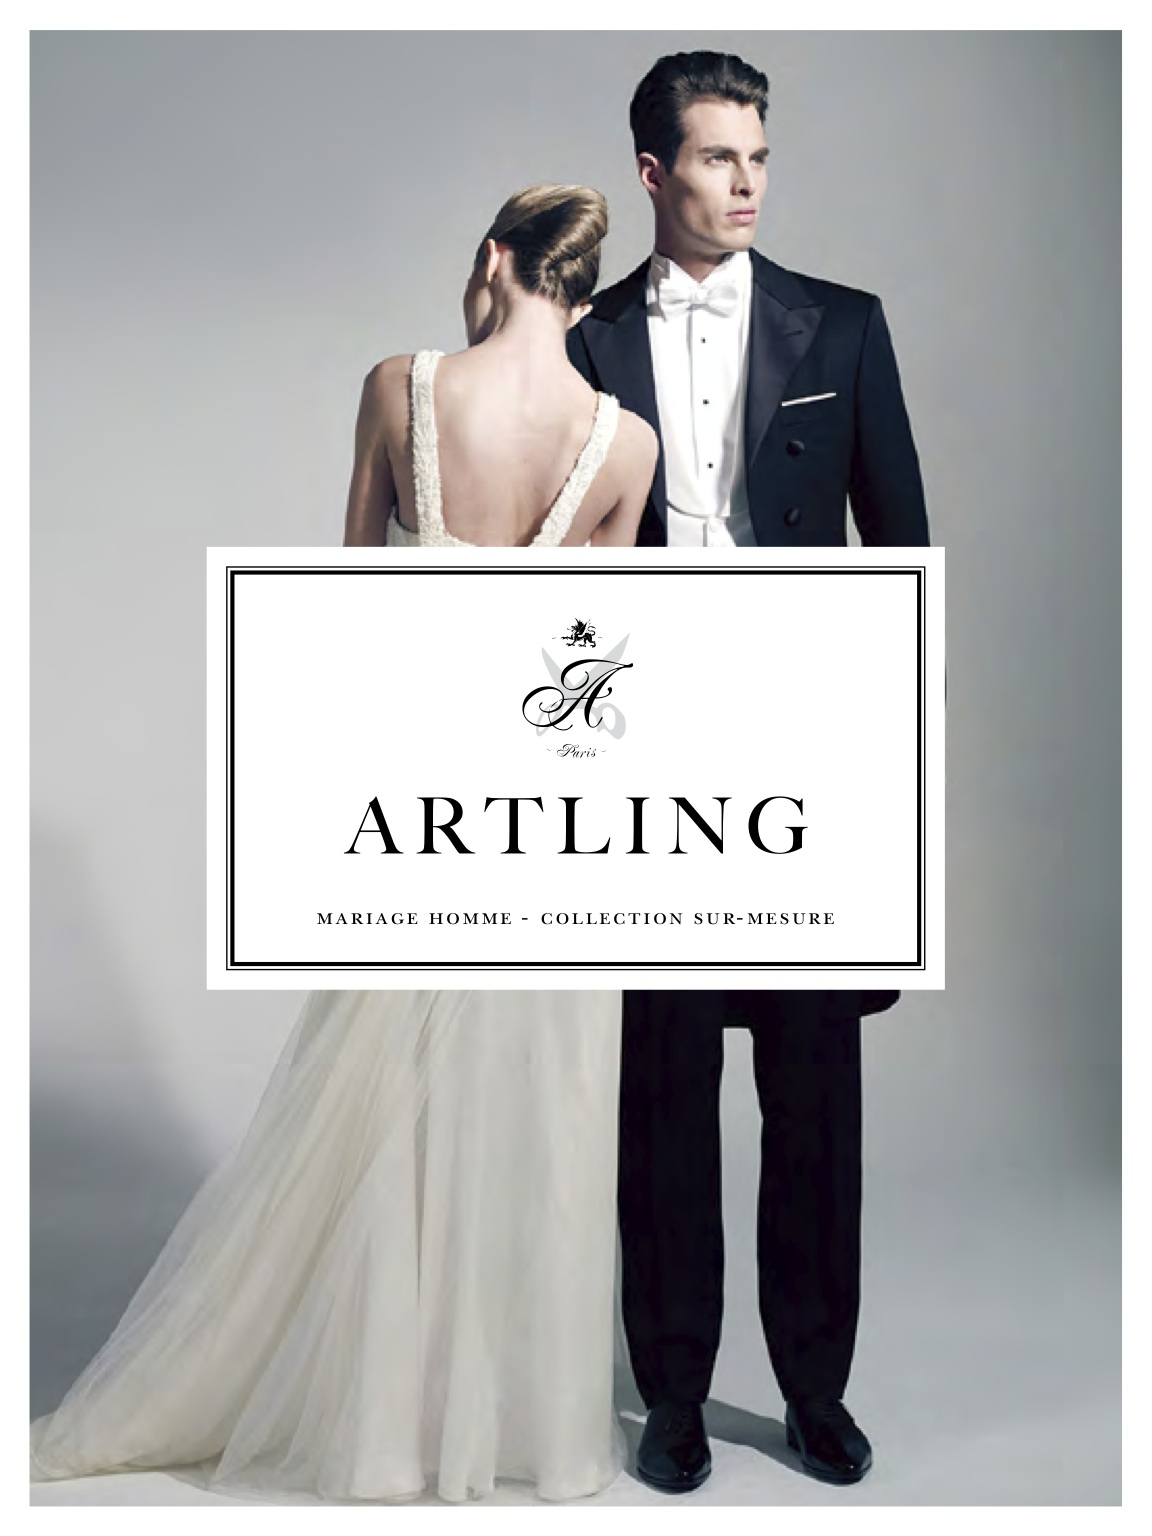 Artling_Costume-sur-mesure_Collection-Mariage-Homme.jpg